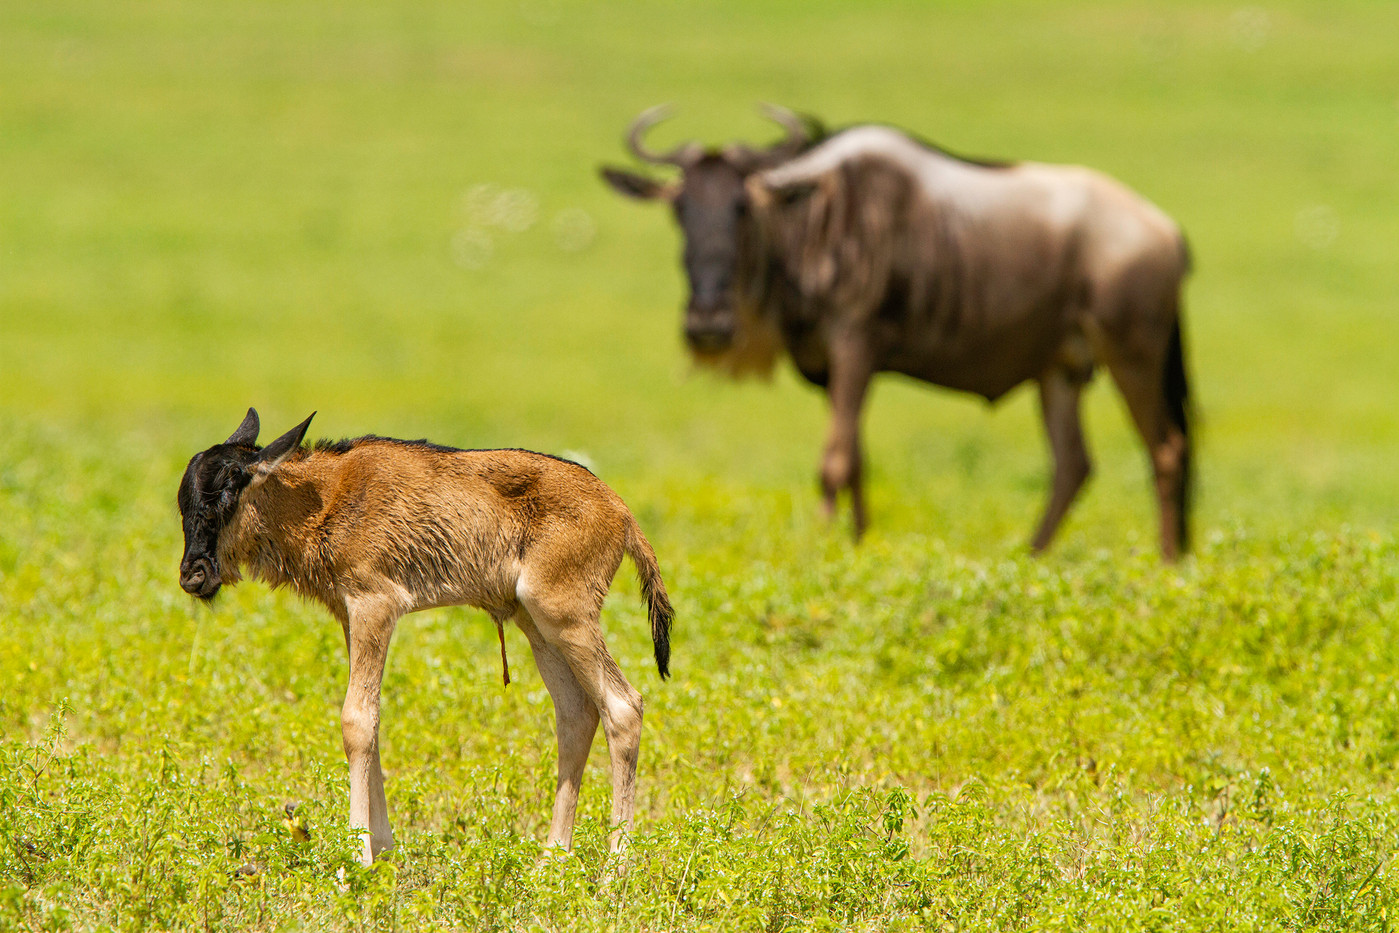 Wildebeest foal in the Ngorongoro Crater, Tanzania